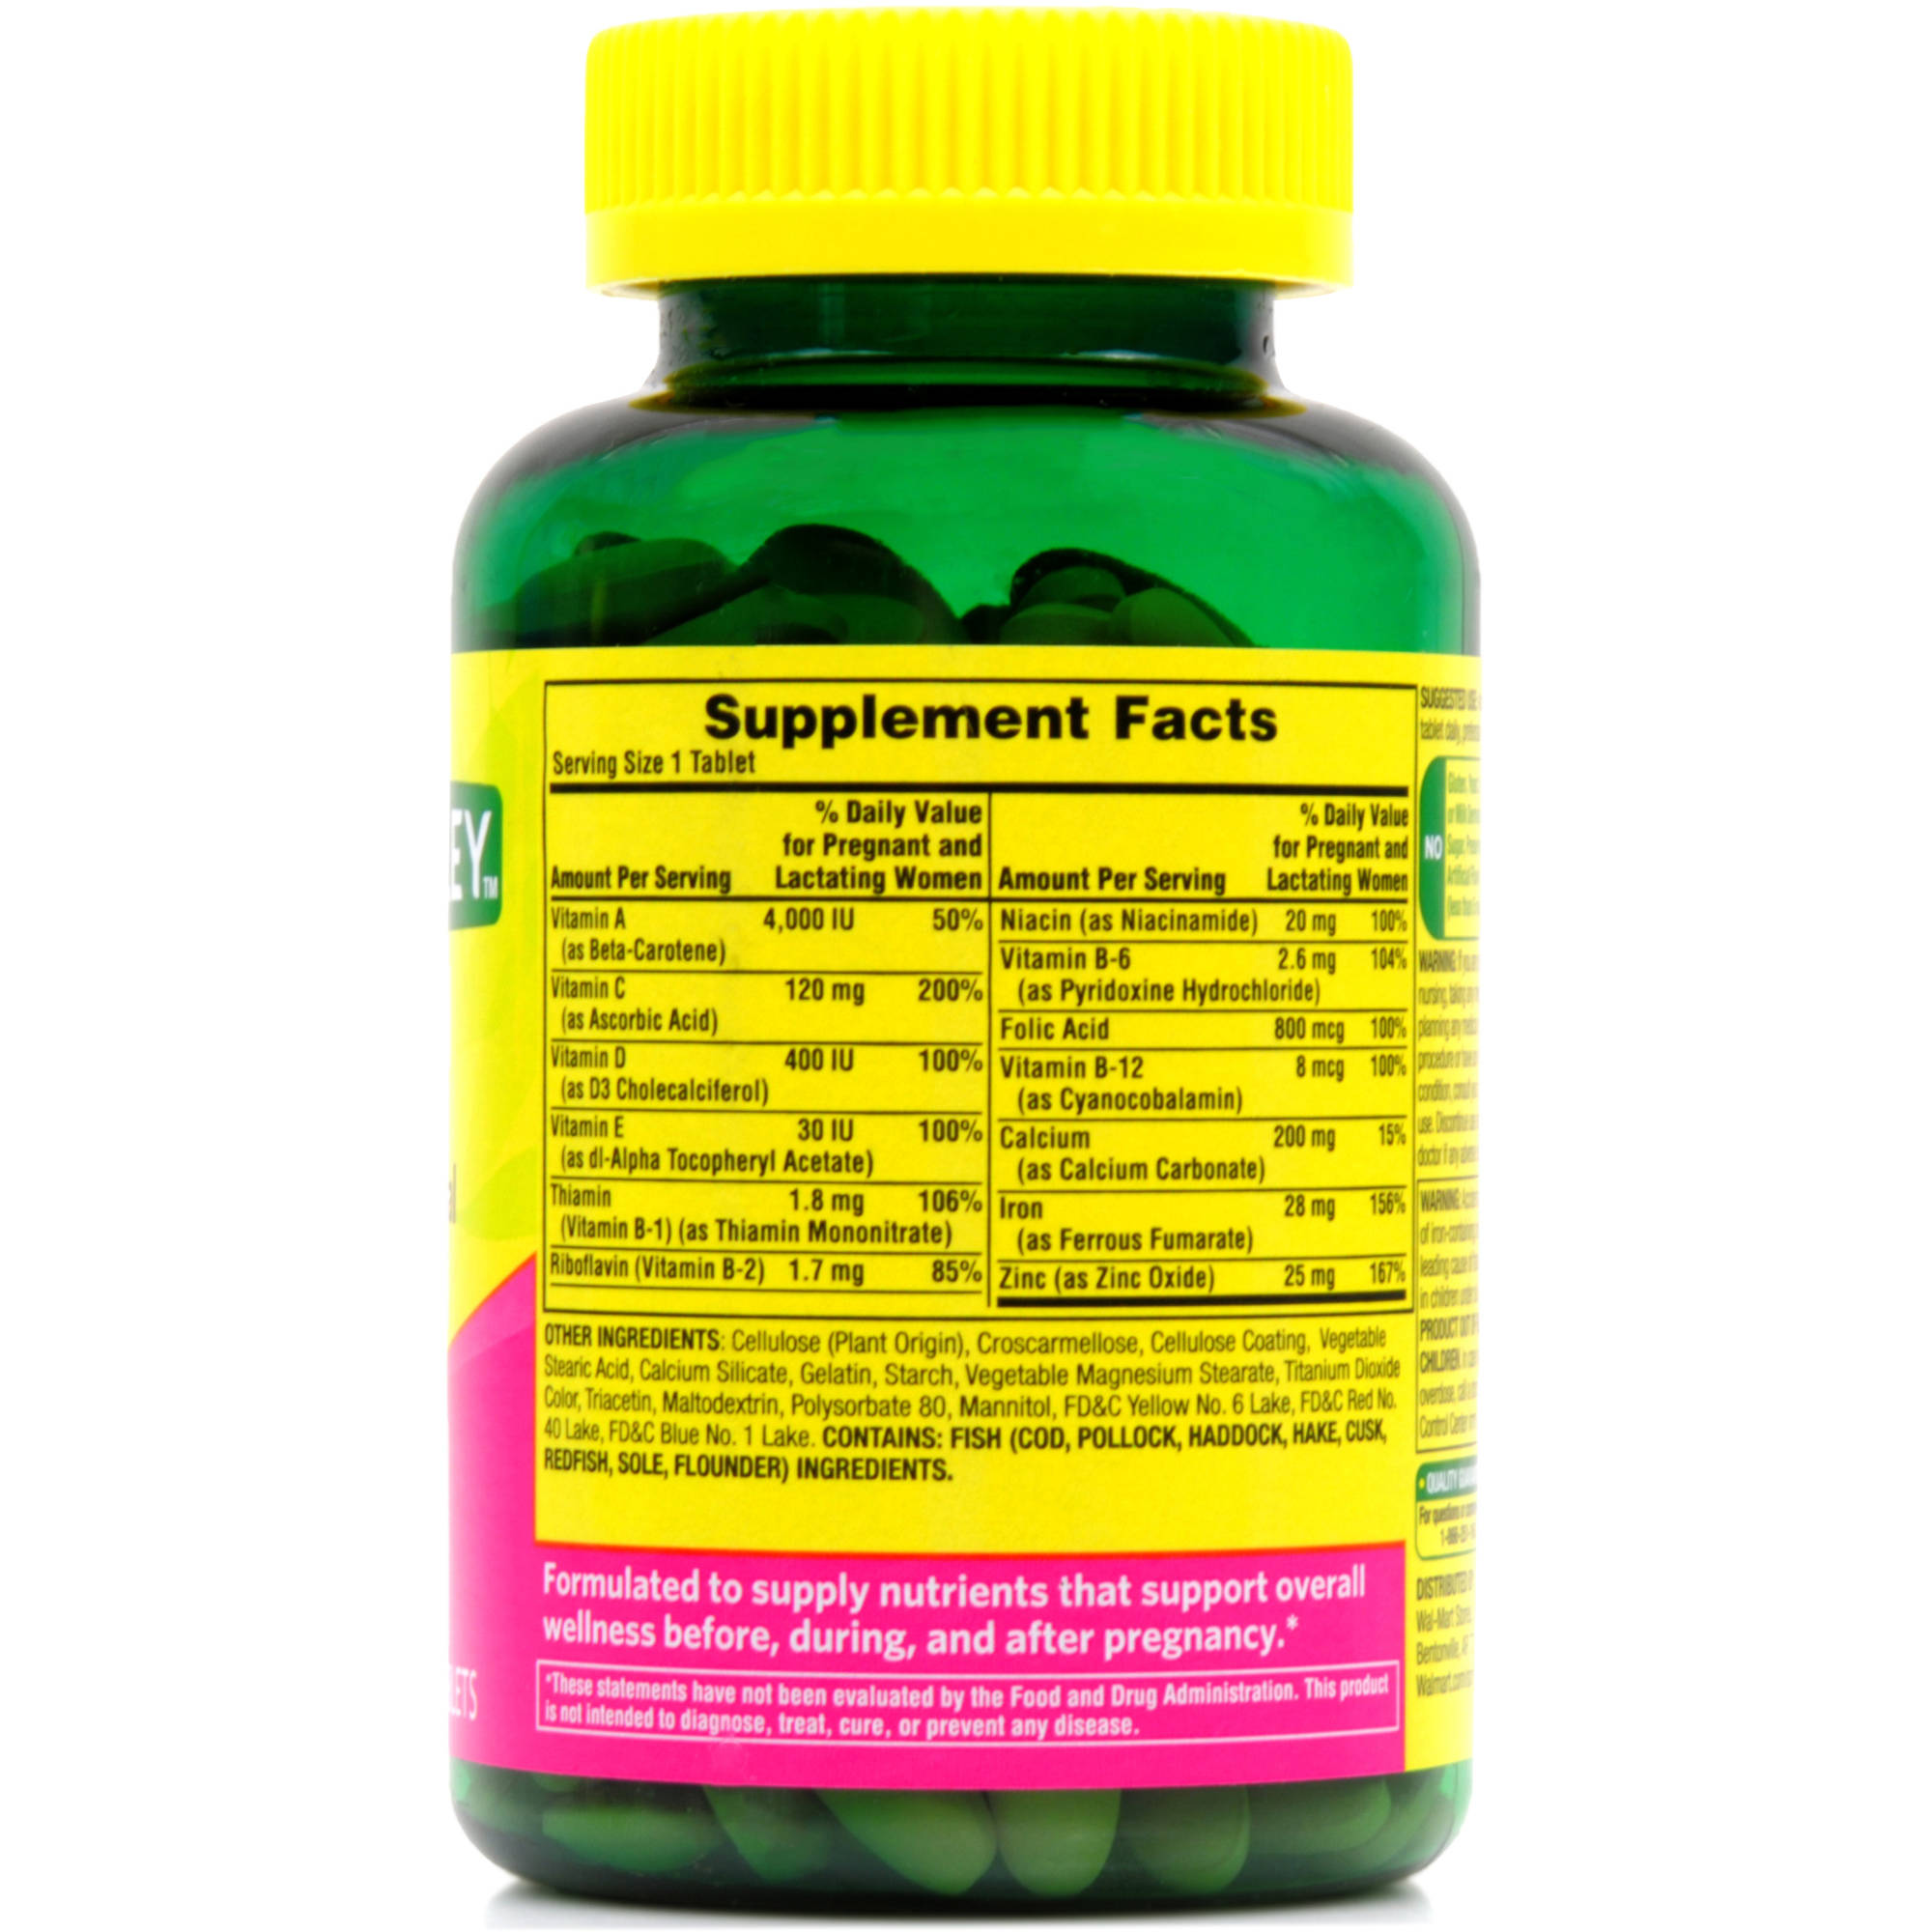 Spring Valley Prenatal Gummy Vitamins Nutrition Facts